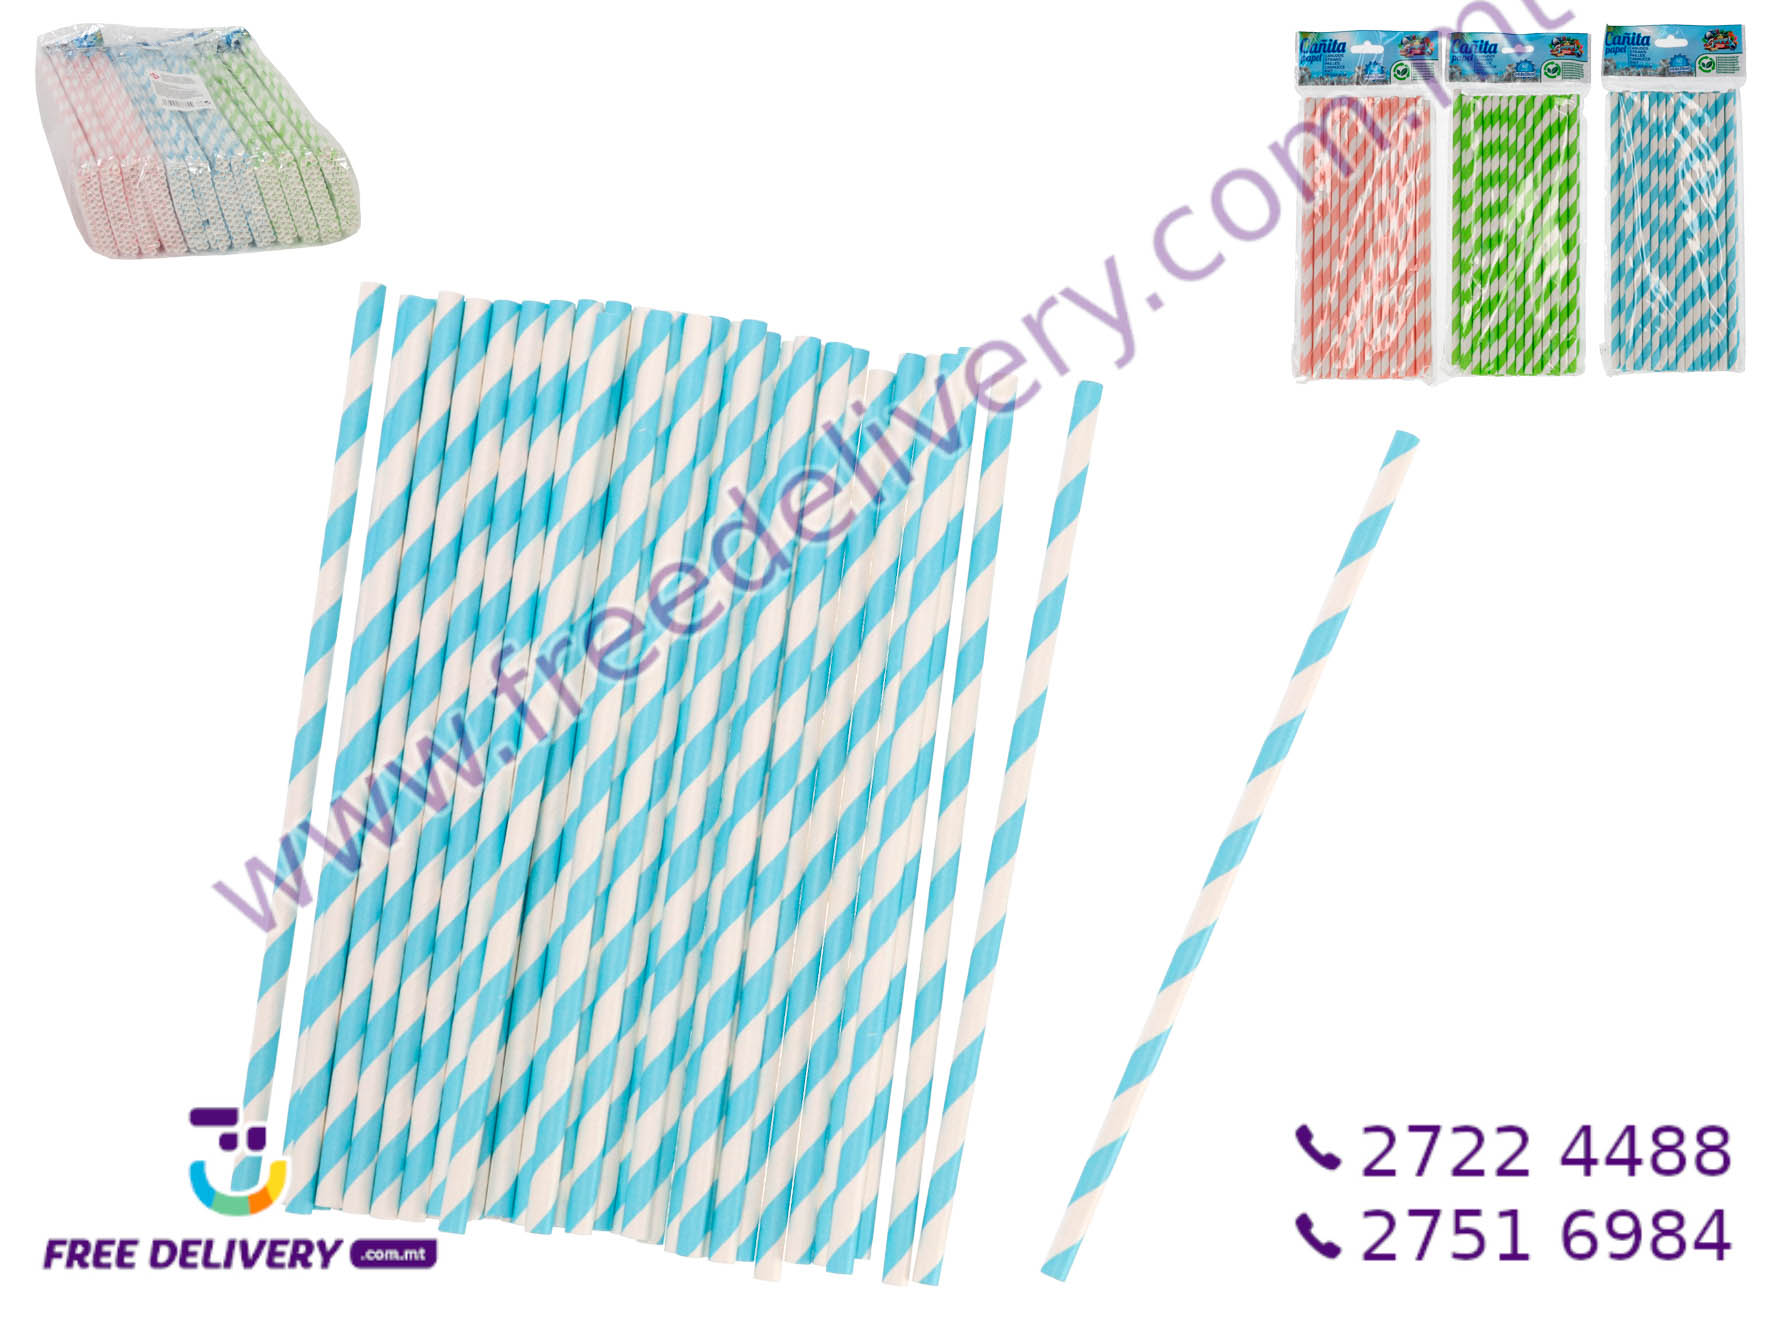 40 PAPER STRAW SET 20CMx0.6CM GE877824